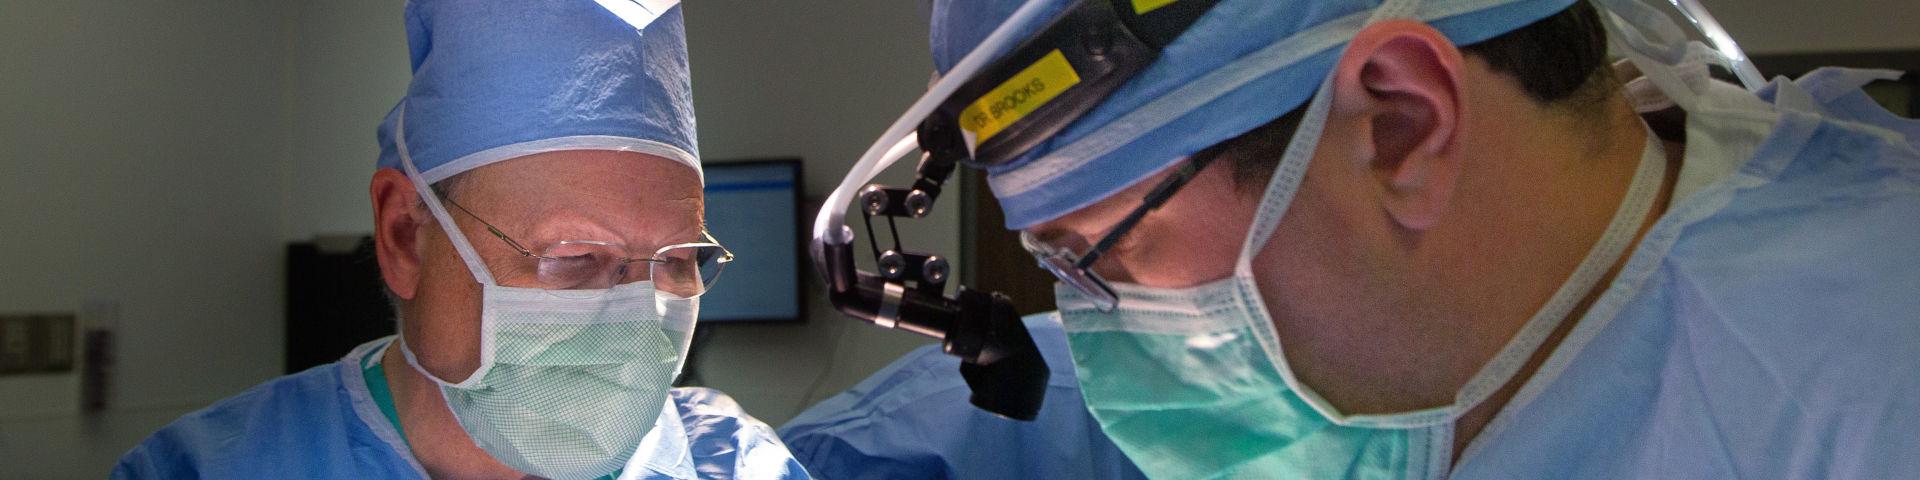 Richards surgery 200205 213846